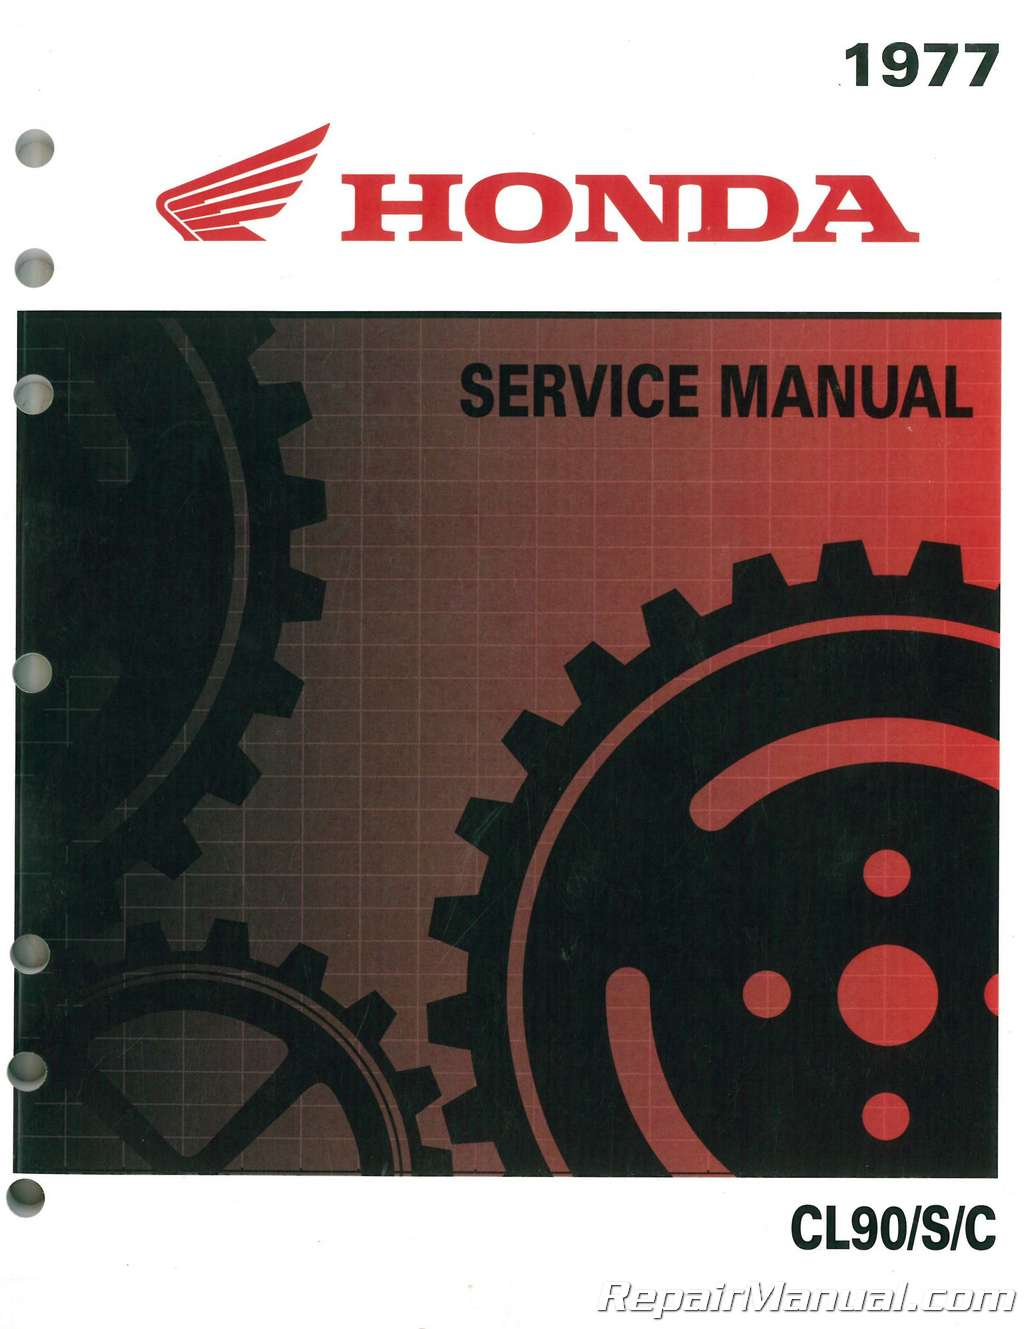 1964 1977 honda s90 cl90 c90 cd90 ct90 cl90l motorcycle service manual rh repairmanual com Honda S65 honda s90 service manual